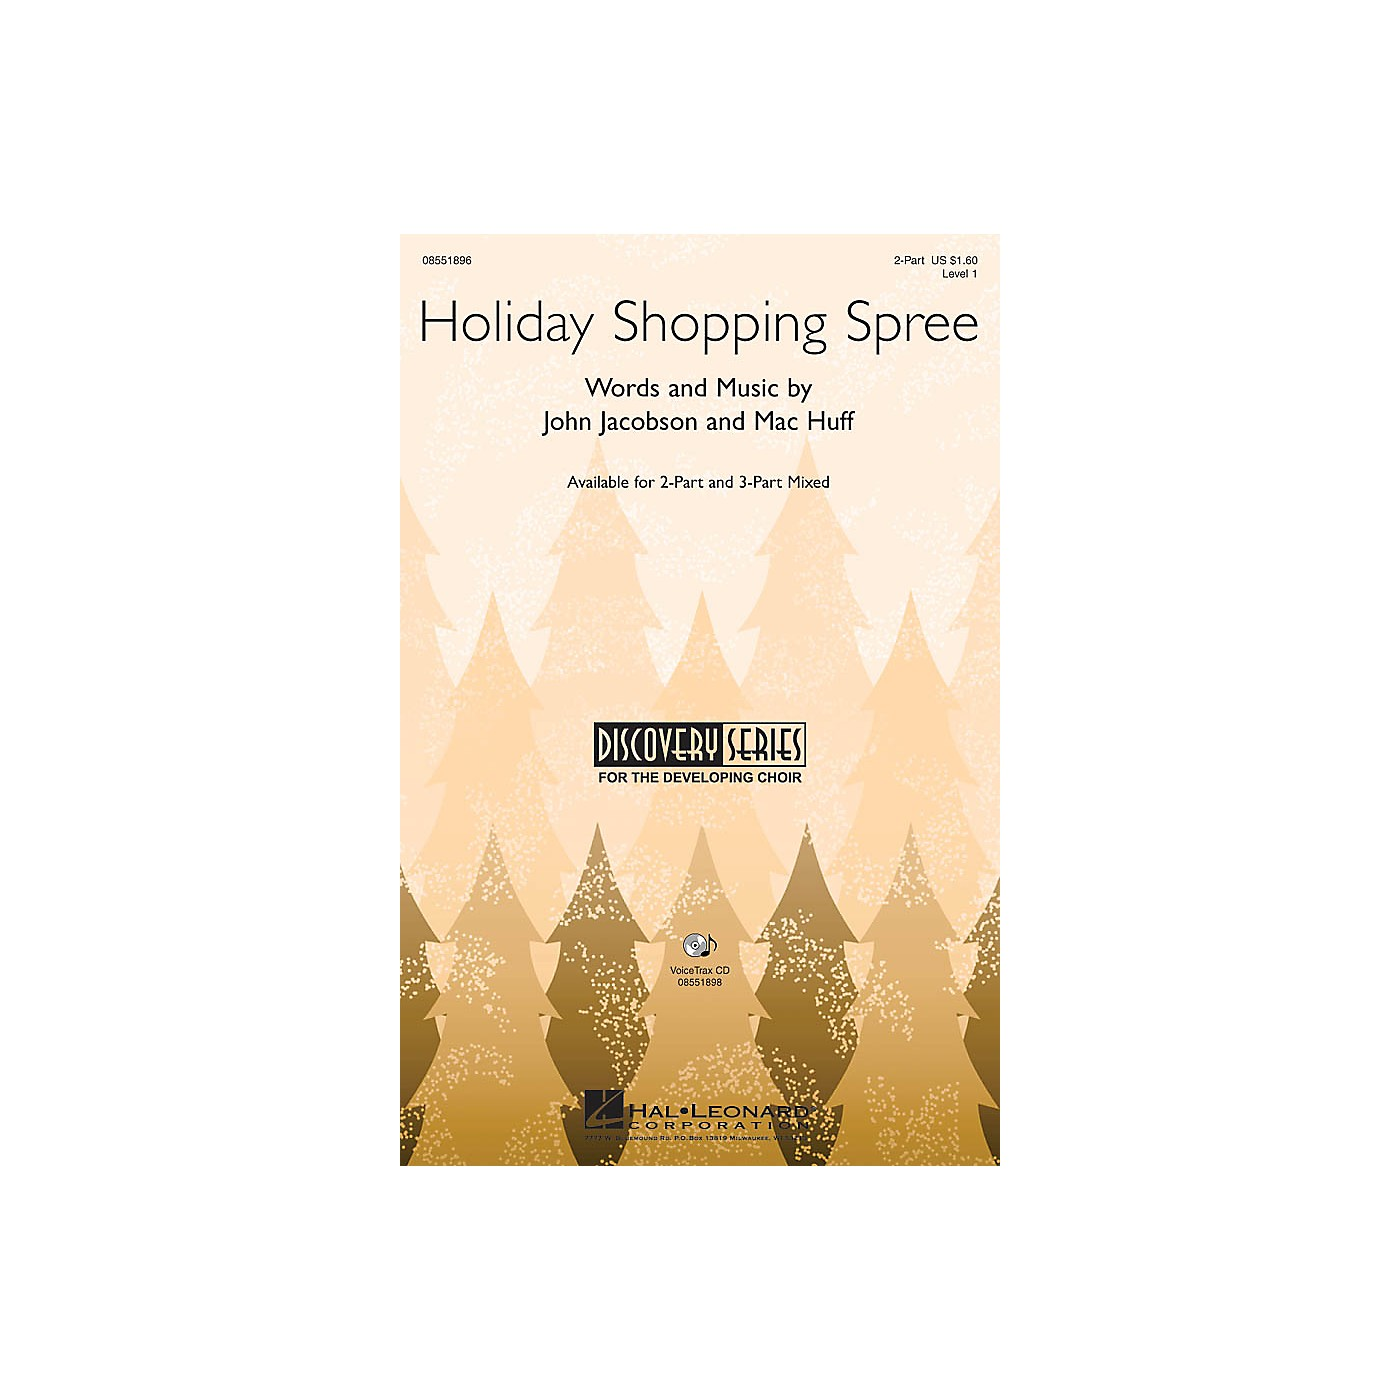 Hal Leonard Holiday Shopping Spree 3-Part Mixed Composed by John Jacobson, Mac Huff thumbnail